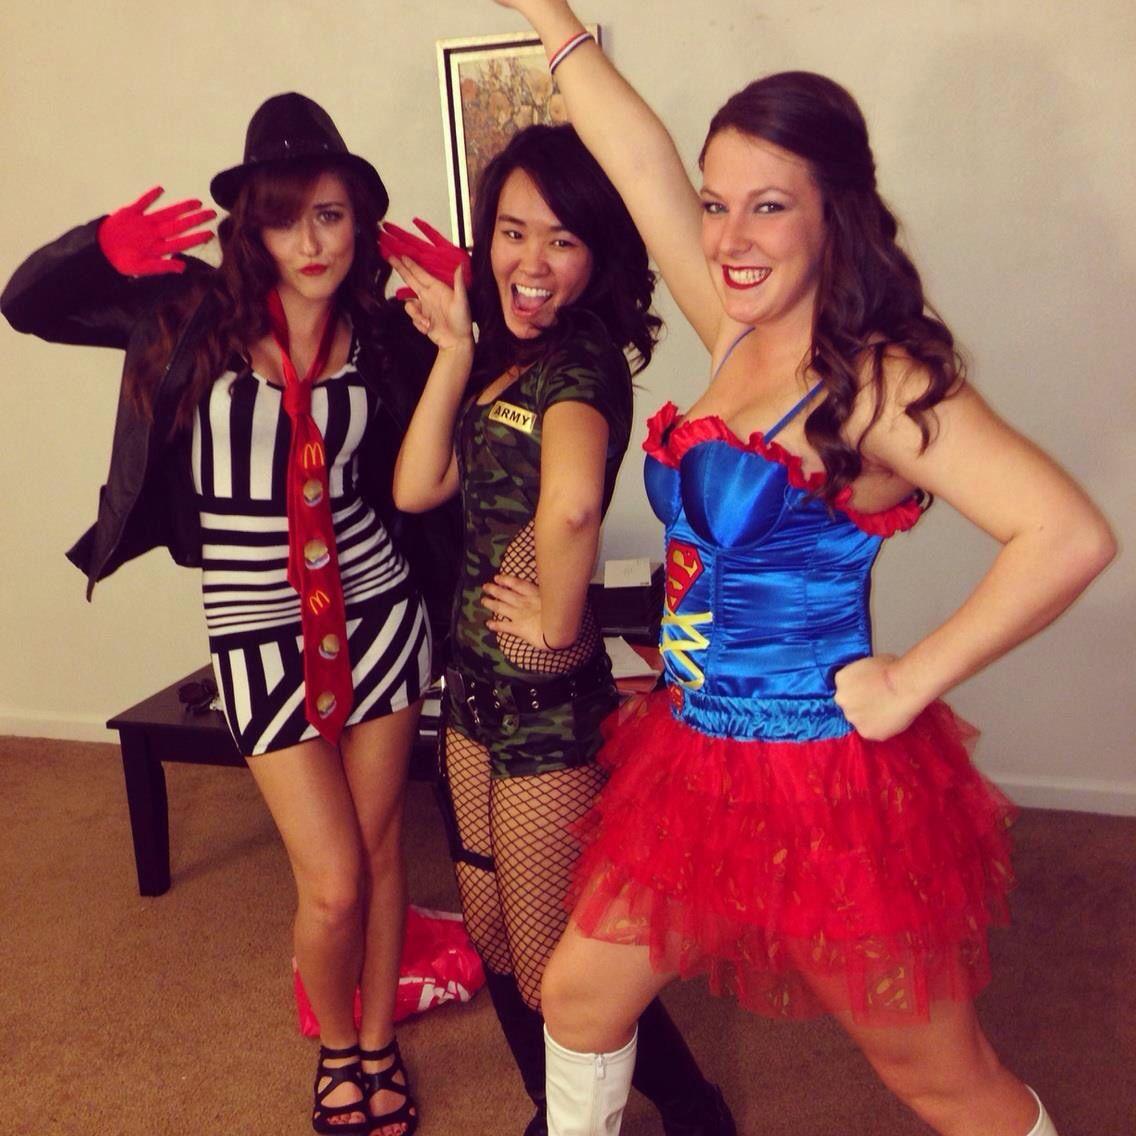 halloween 2k13 with my babies! #college #costumes #halloween